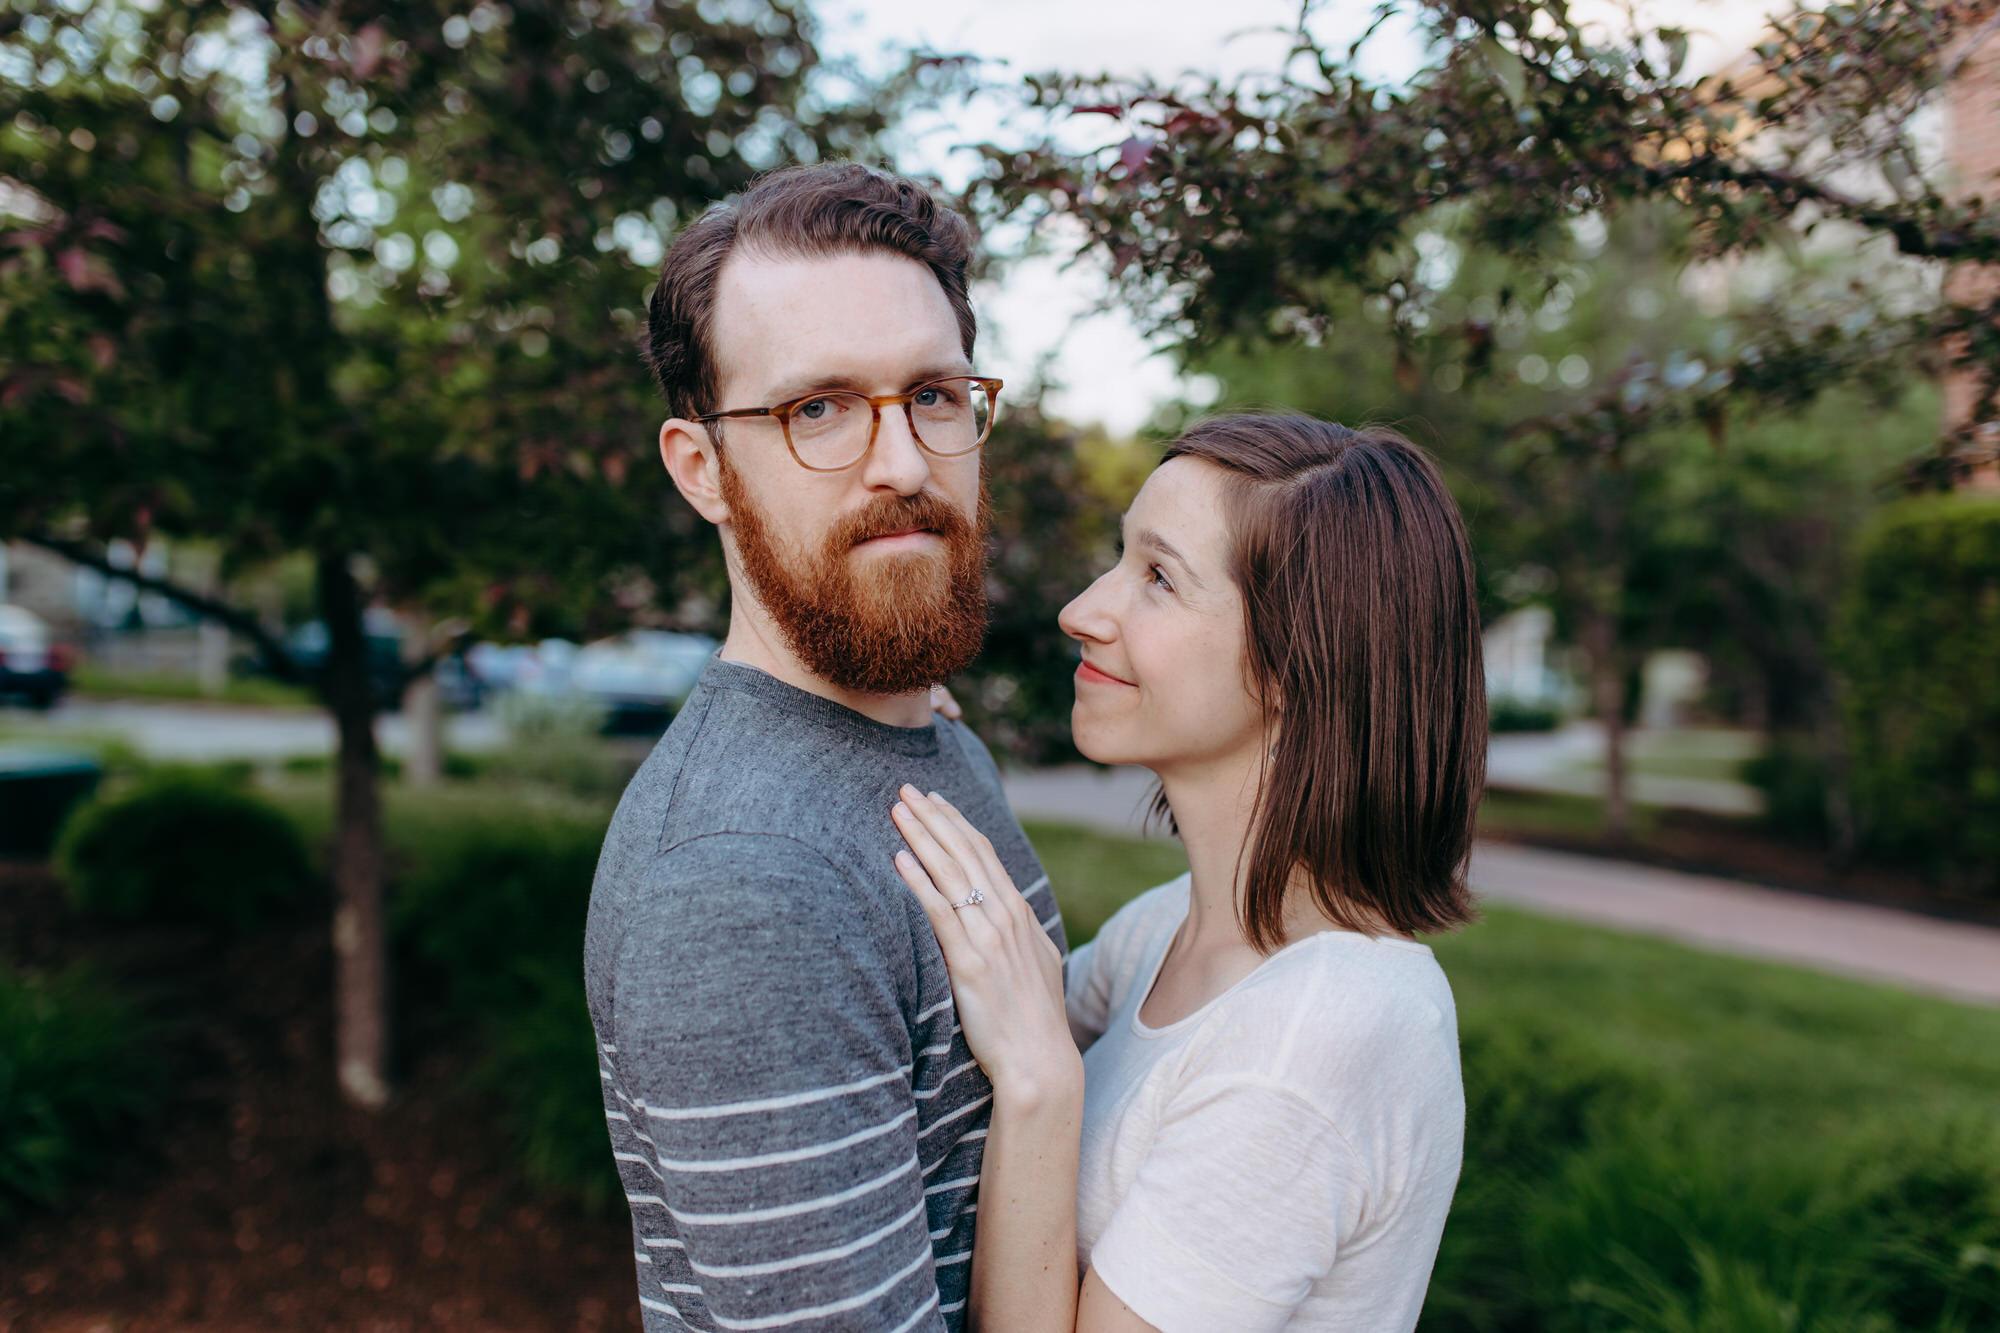 6-2-18_Chris and Nicole_71.jpg